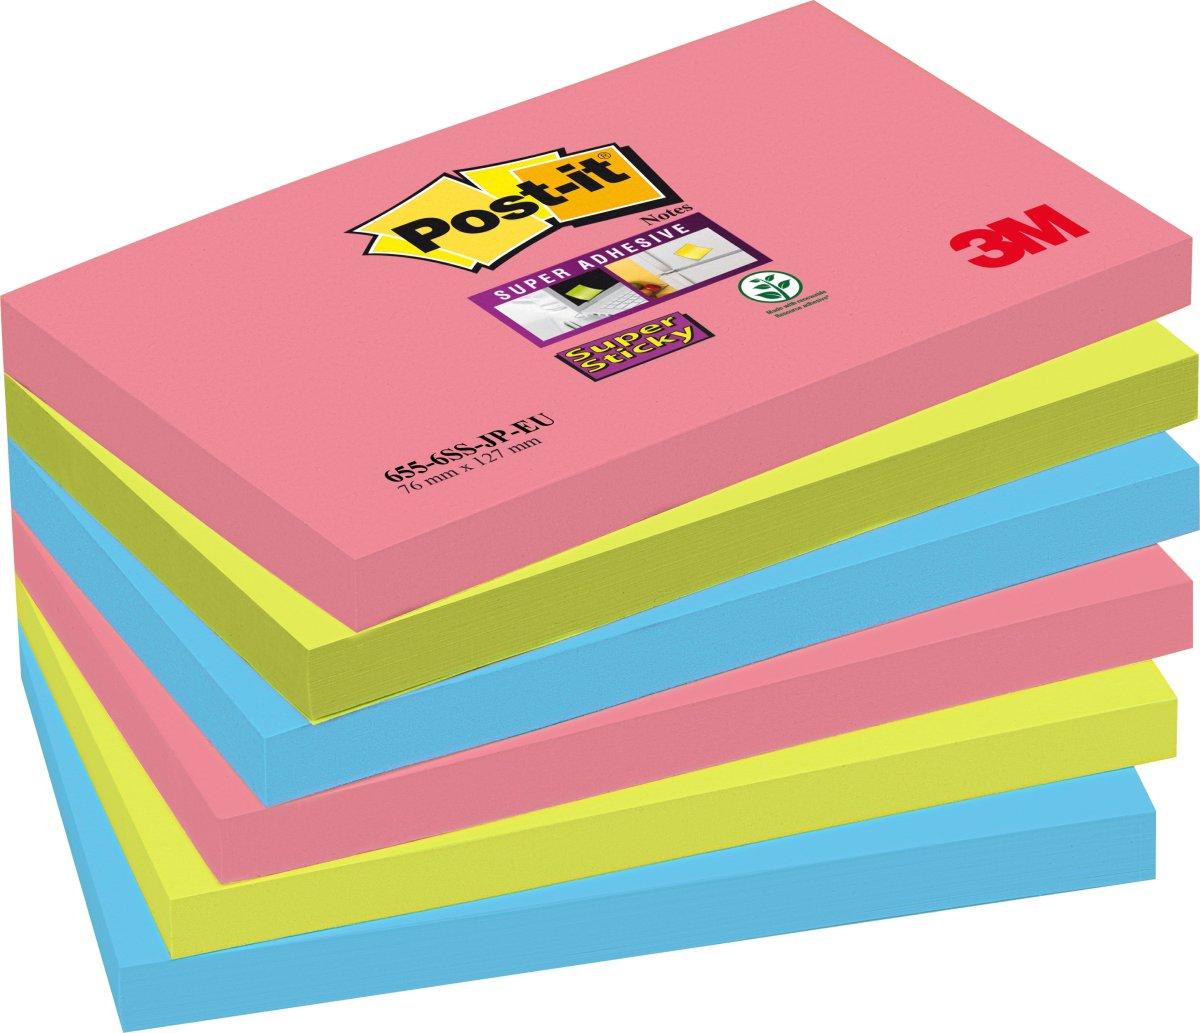 Post-it Super Sticky Notes 76 x 127mm, Bora Bora